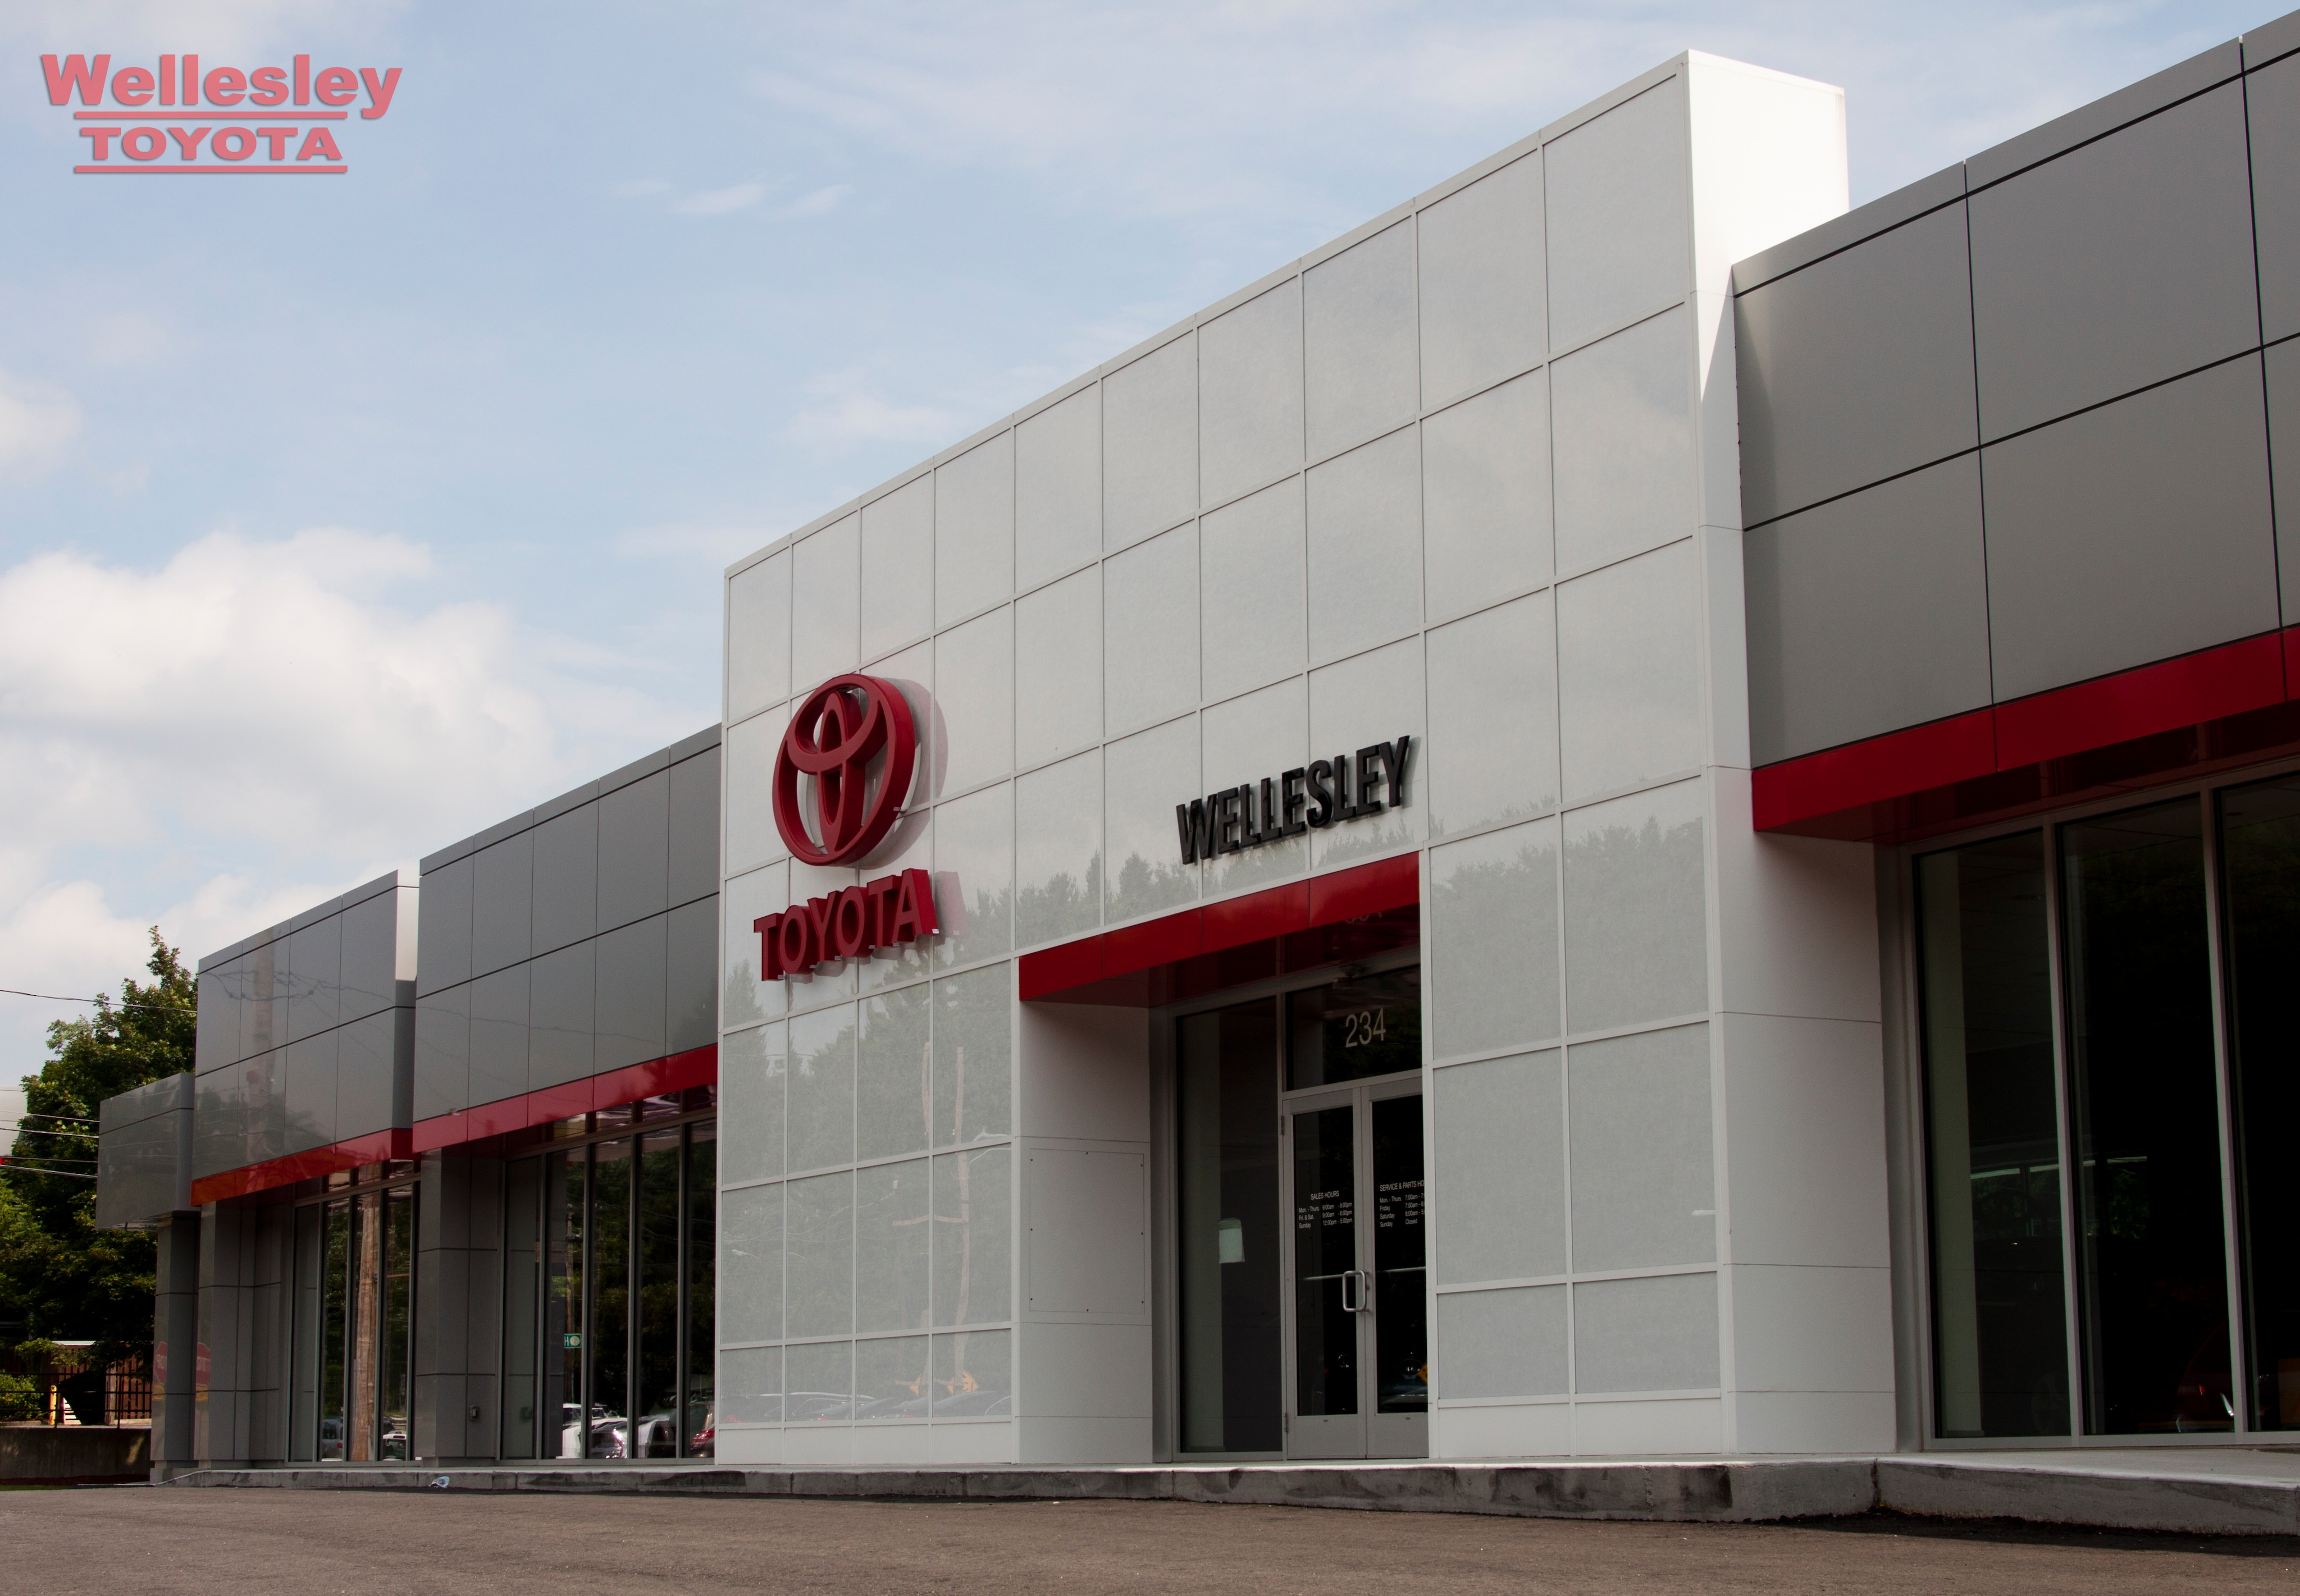 Wellesley Toyota New Toyota Dealership Near Boston